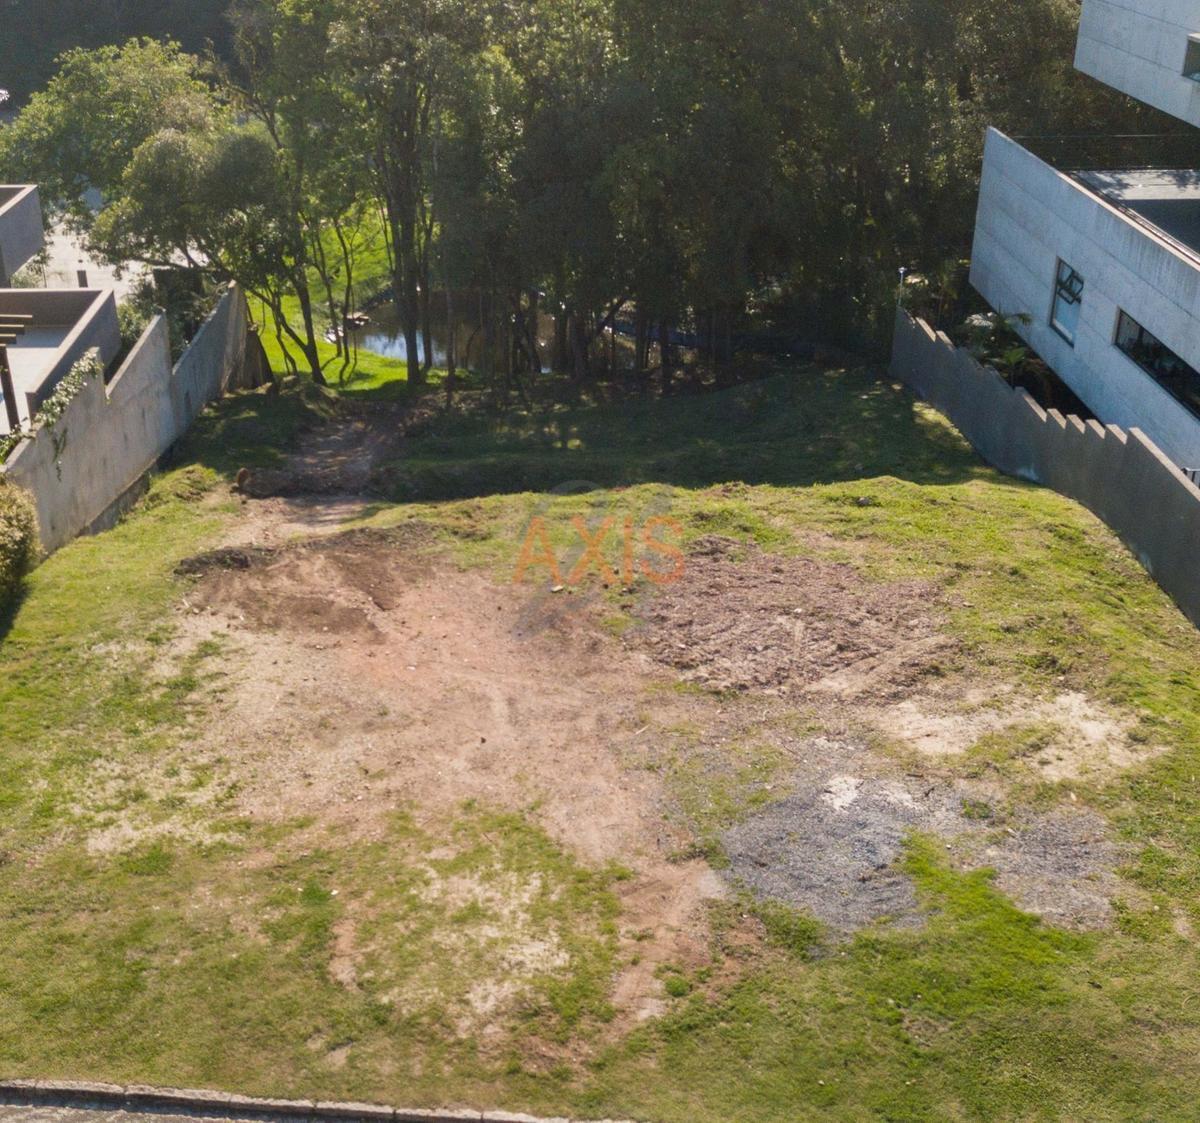 http://www.infocenterhost2.com.br/crm/fotosimovel/322851/89805963-terreno-em-condominio-curitiba-santo-inacio_marcadagua.jpg